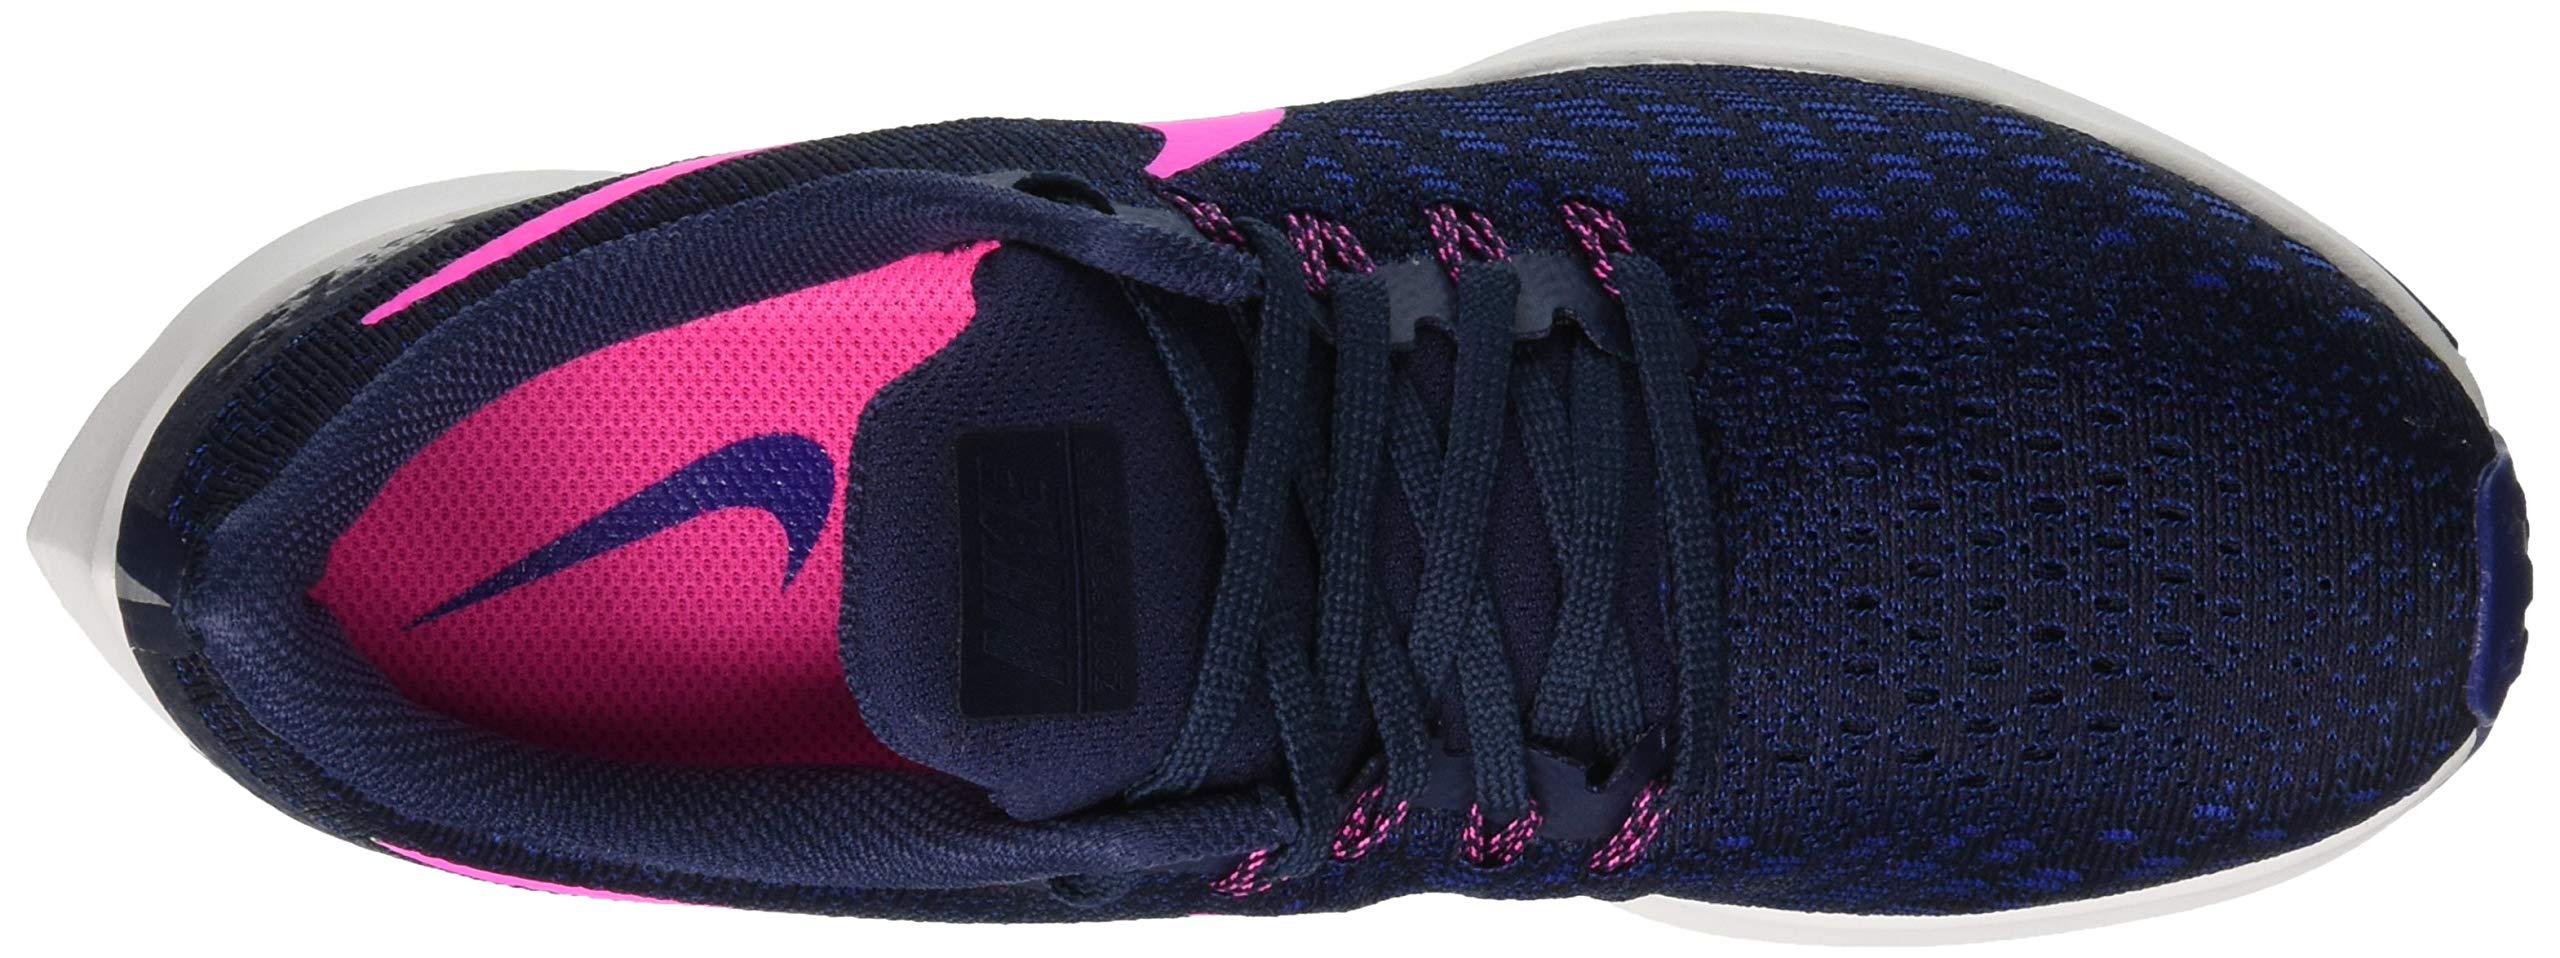 Nike Air Zoom Pegasus 35, Women's Running, Multicolored (Obsidian/Pink Blast/Deep Royal Blue 401), 4 UK (EU) by Nike (Image #7)